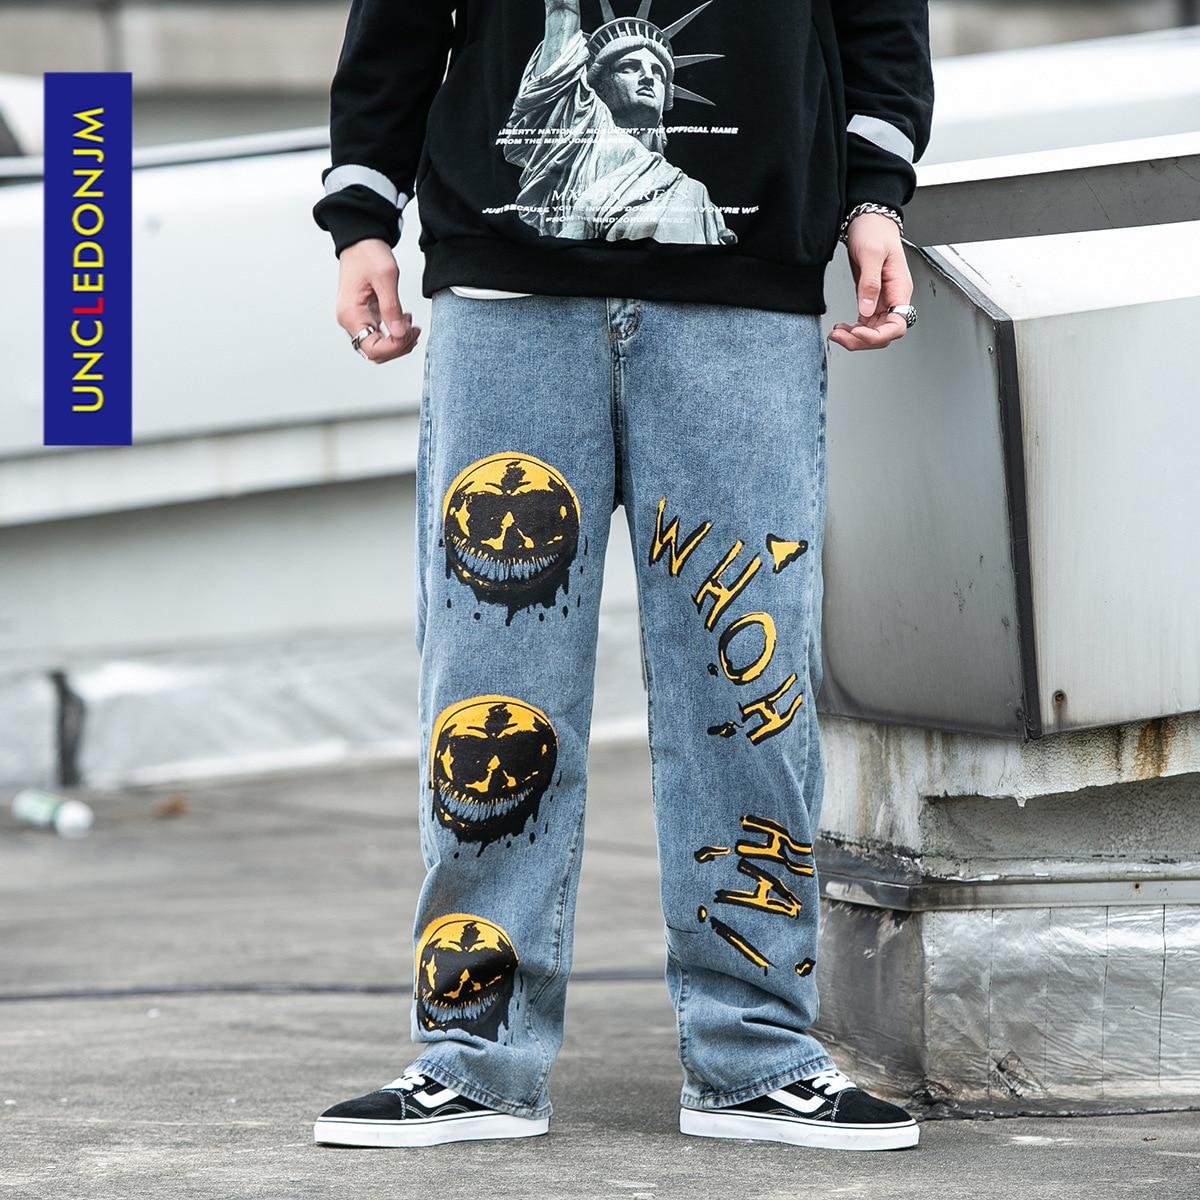 UNCLEDONJM 2020, ropa de calle para hombres, pantalones vaqueros holgados con dibujo grafiti negro, pantalones vaqueros Vintage, pantalones para correr Harajuku 7013